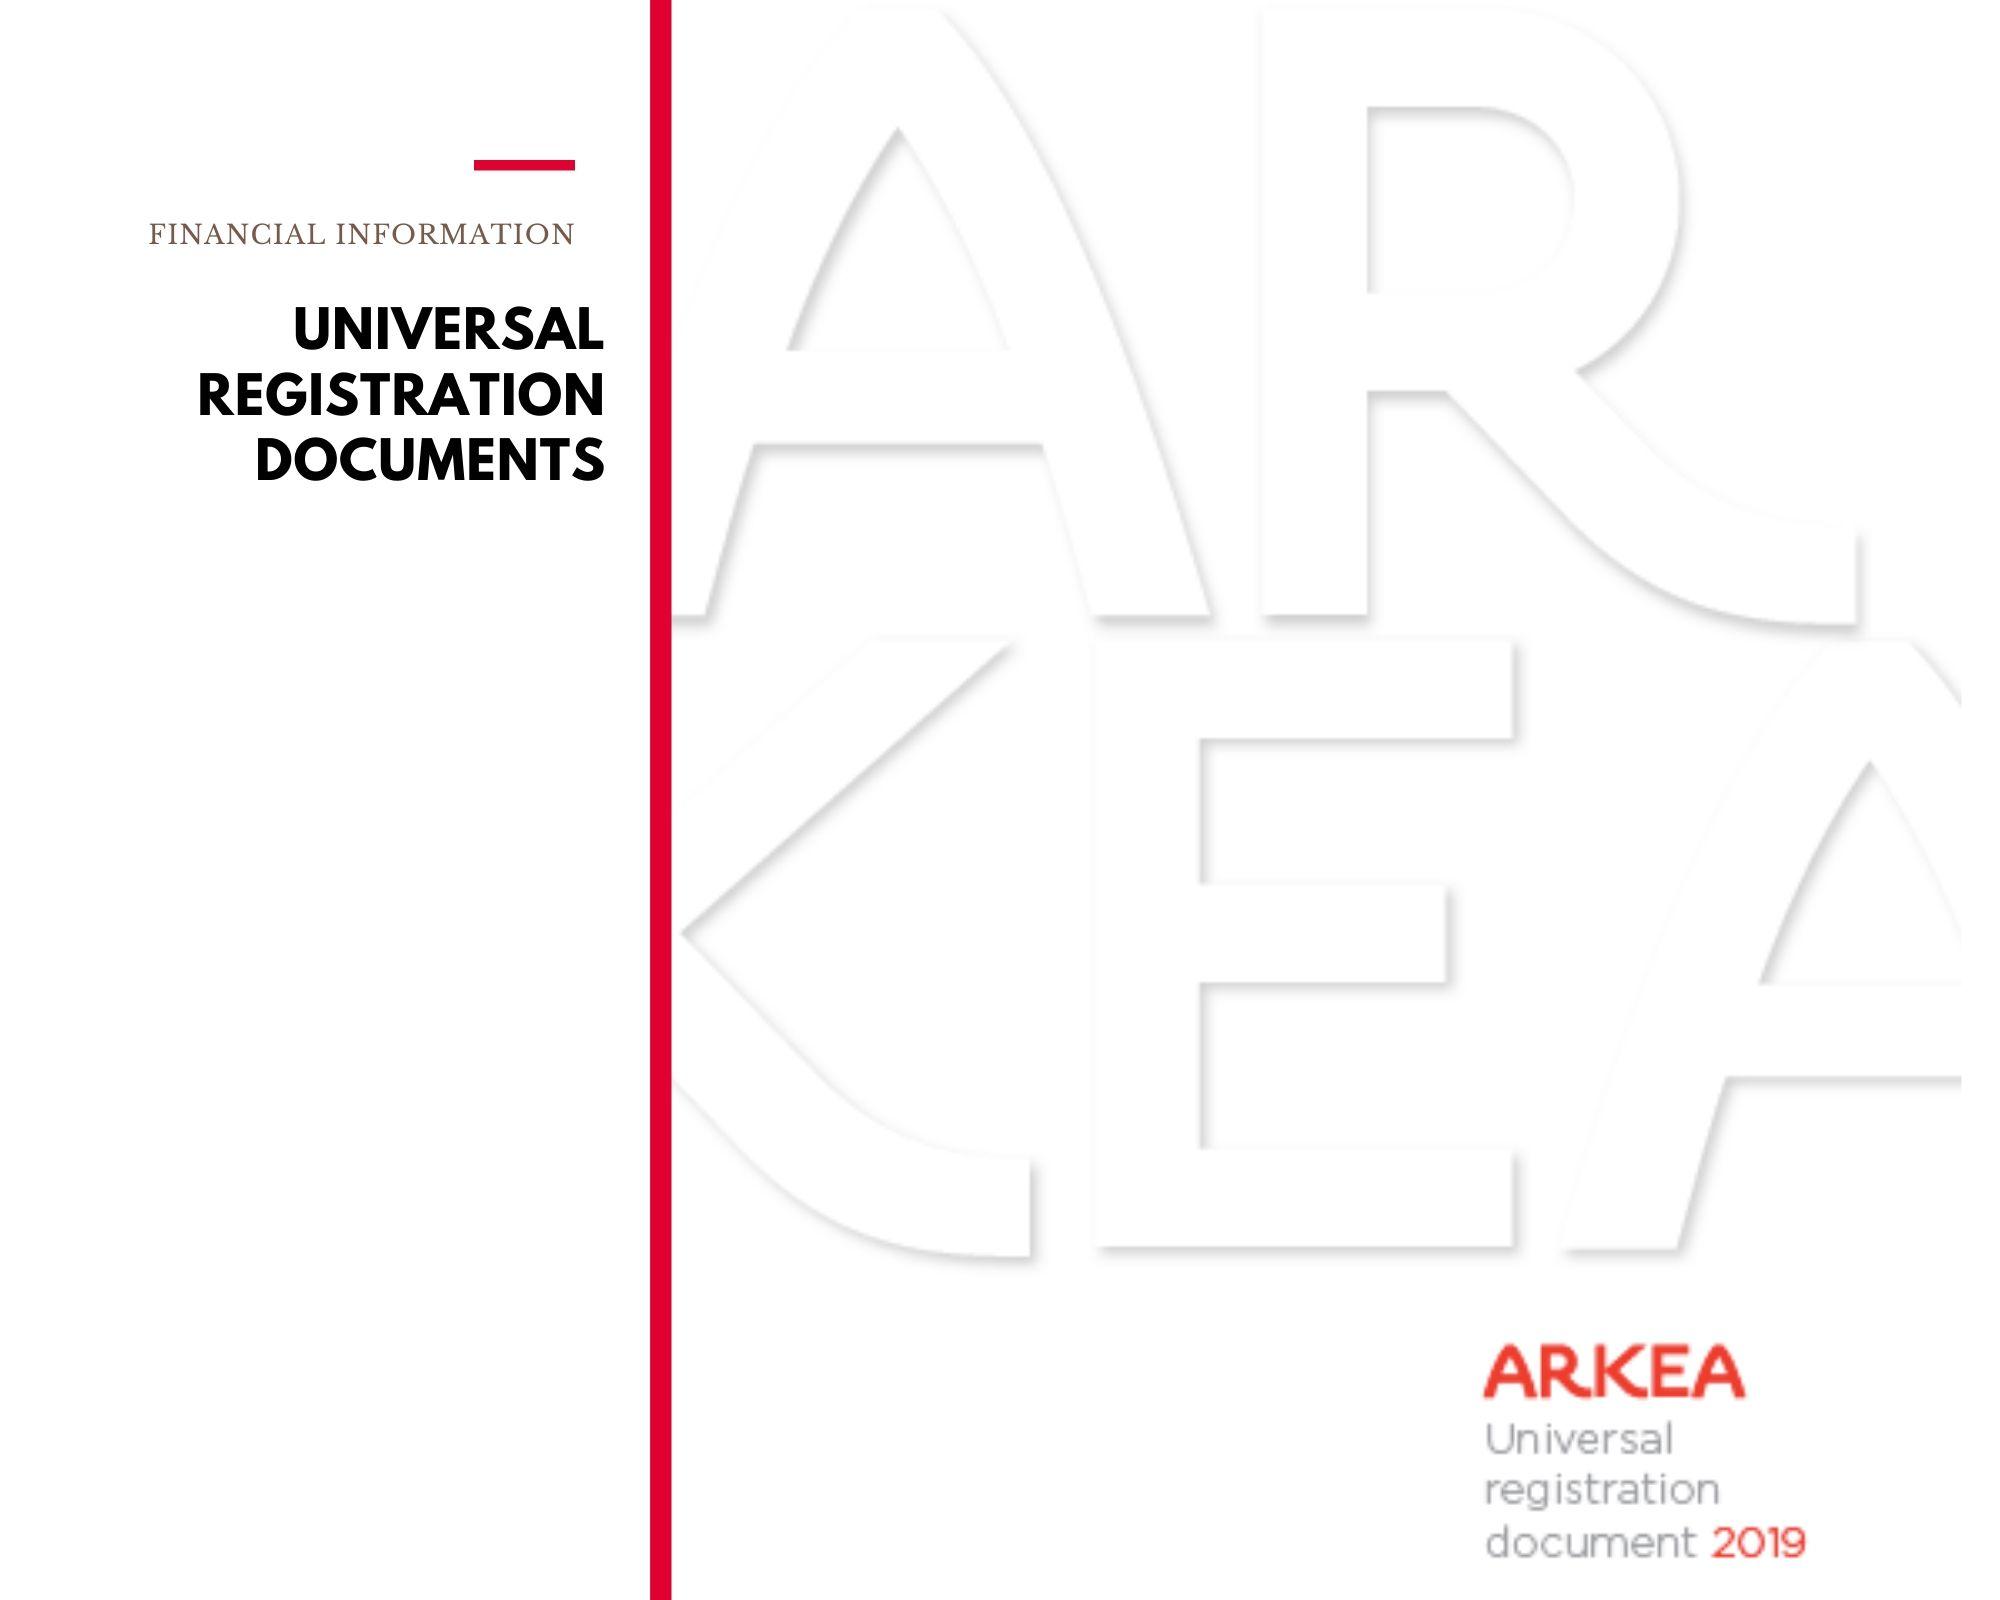 Registration documents picture